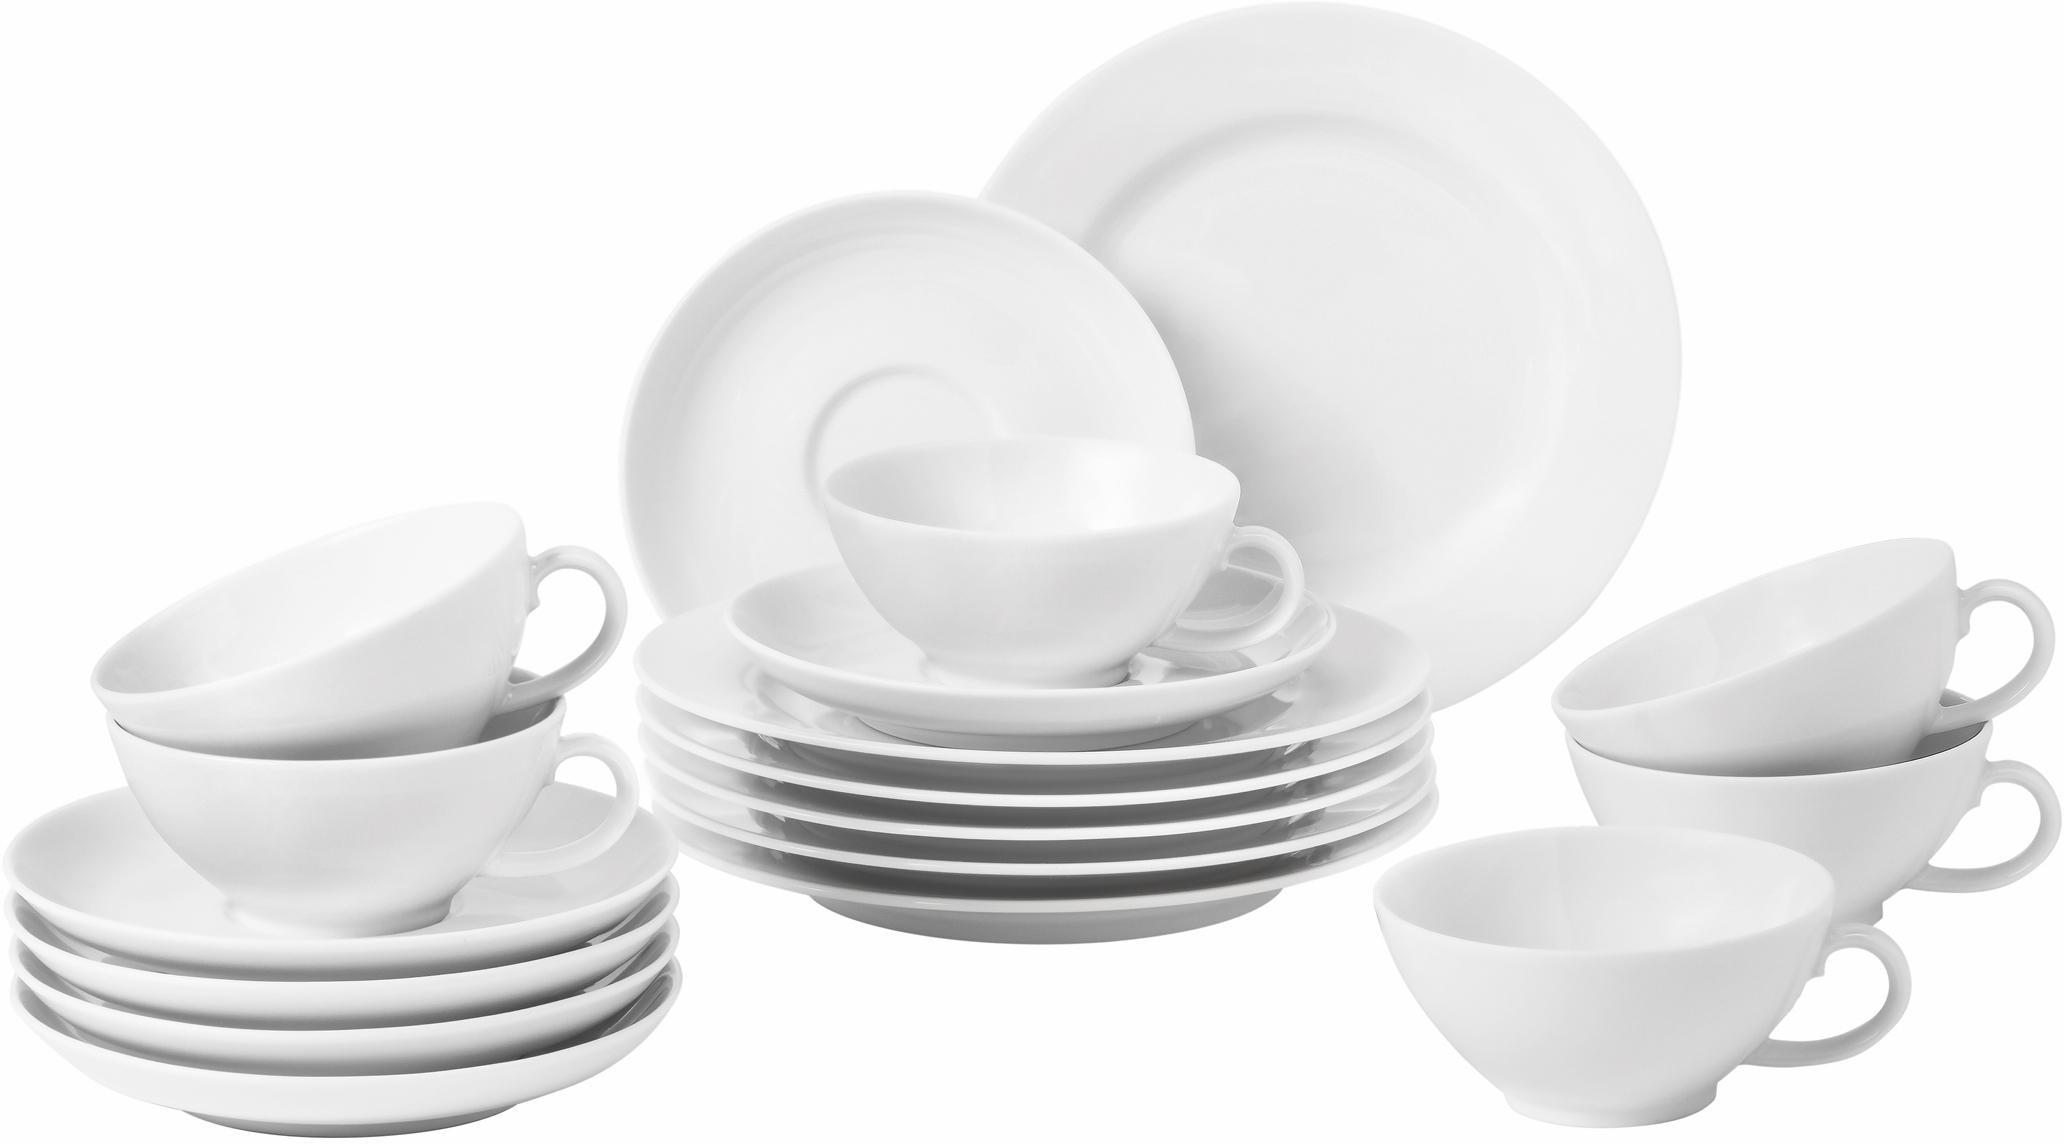 Seltmann Weiden Teeservice Rondo, (Set, 18 tlg.) weiß Geschirr-Sets Geschirr, Porzellan Tischaccessoires Haushaltswaren